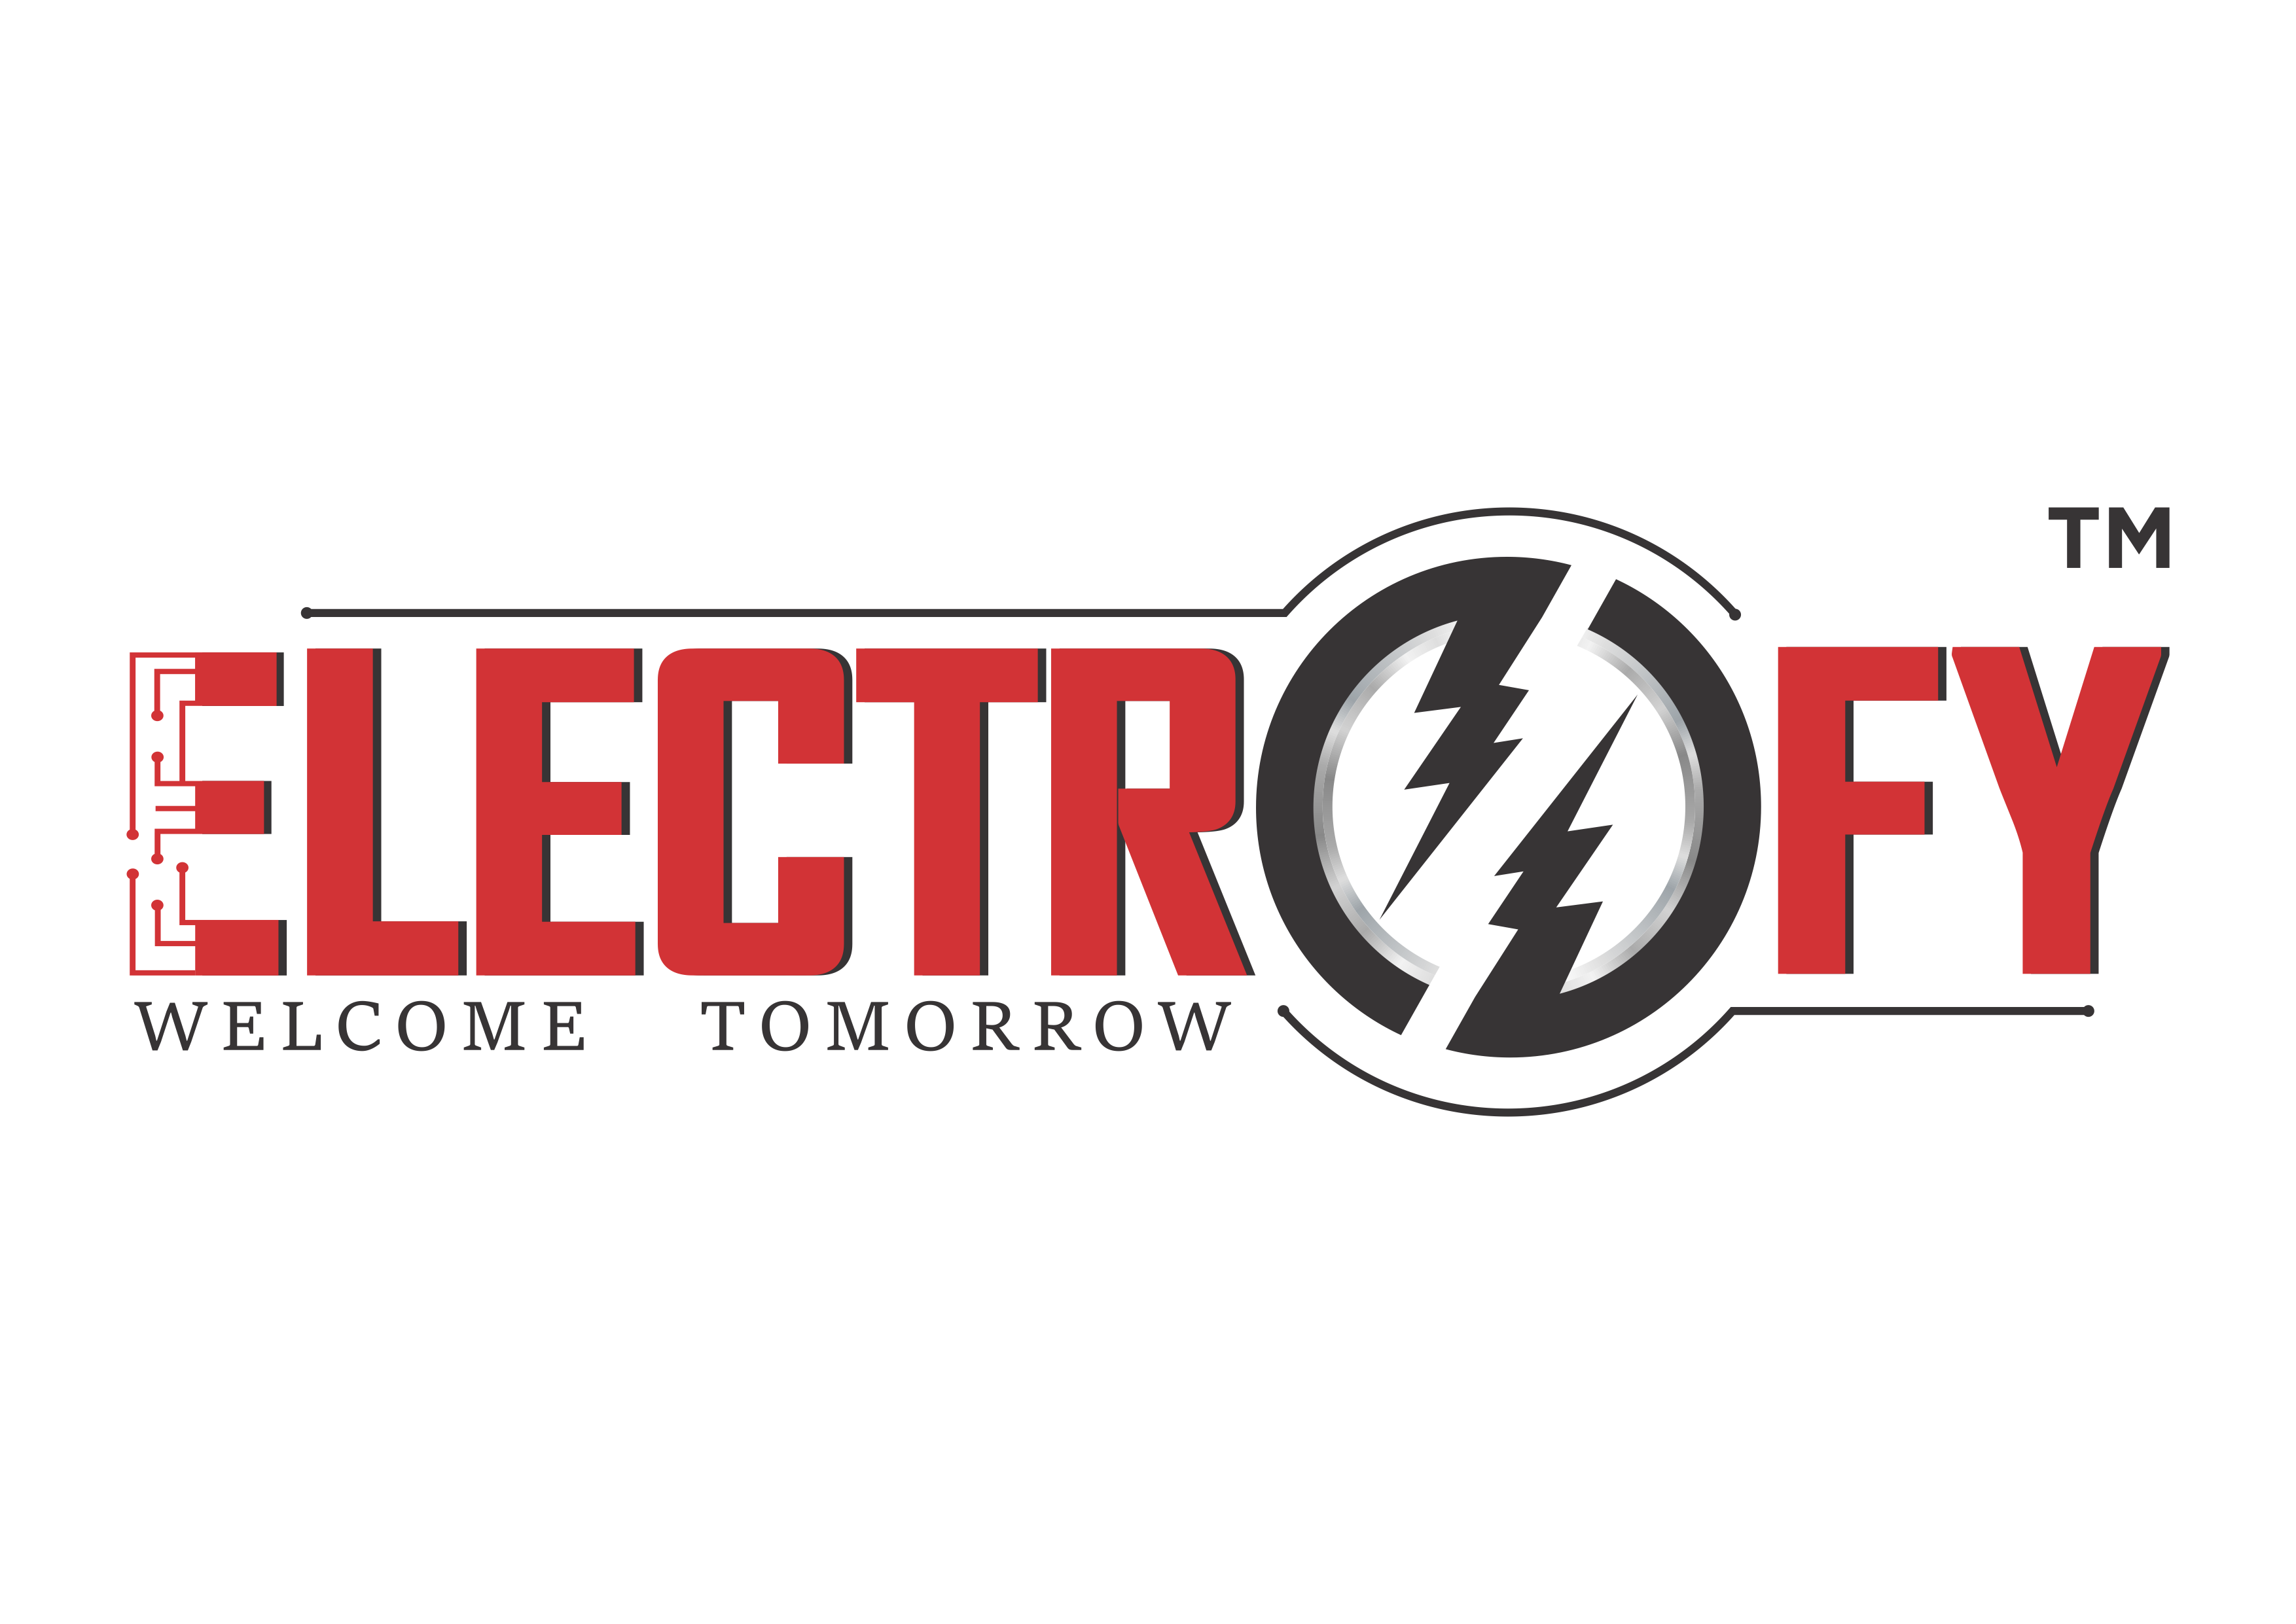 Electrofy - Welcome Tomorrow